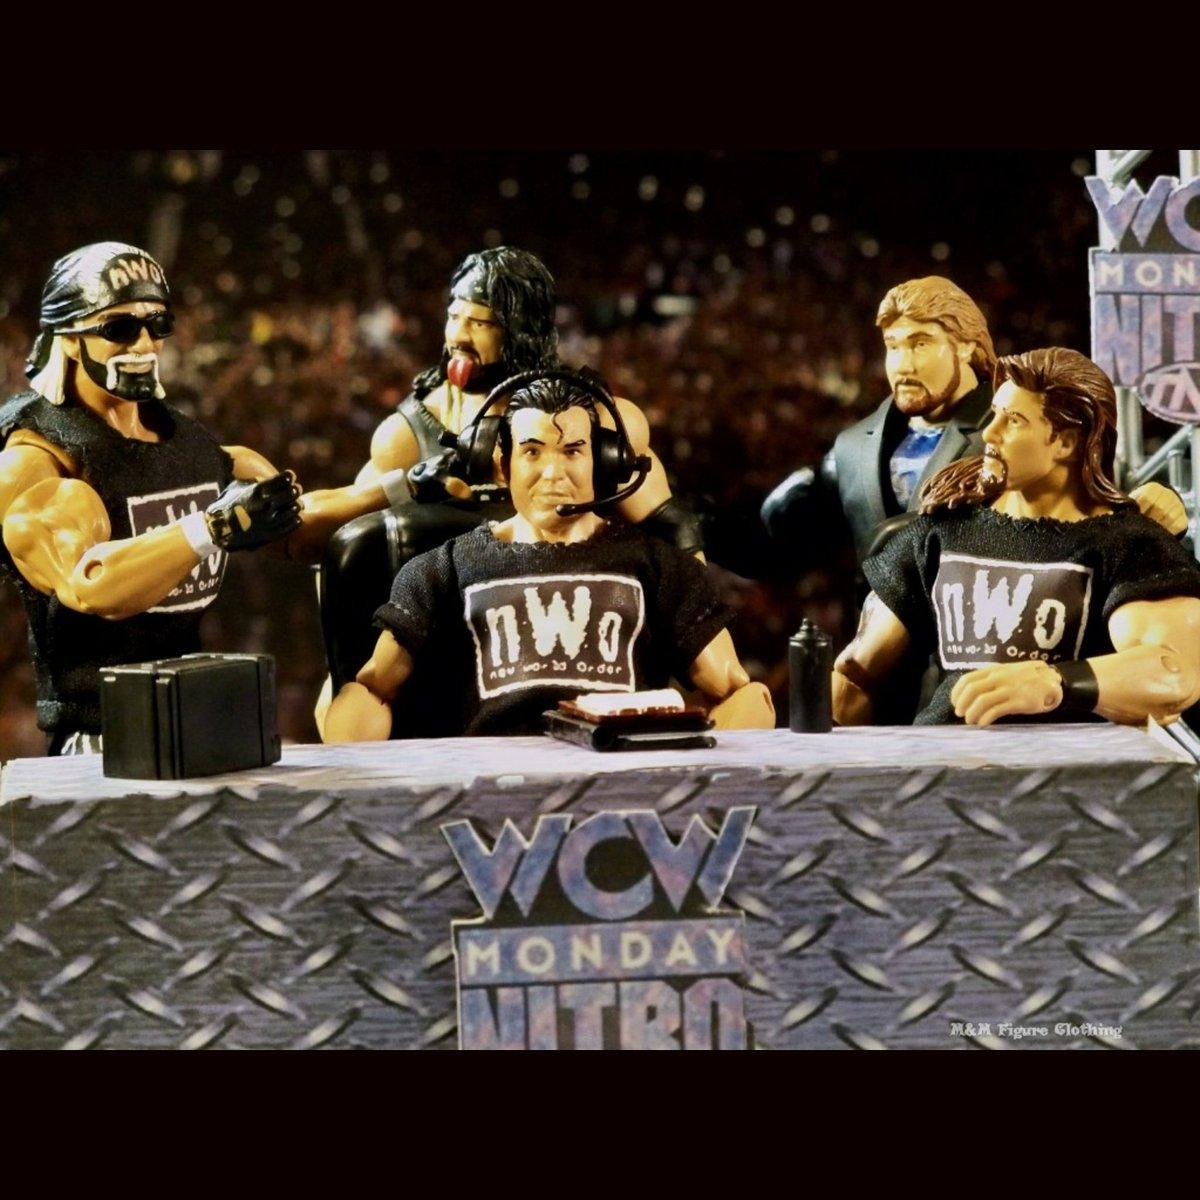 @HulkHogan @TheRealXPac @SCOTTHALLNWO @RealKevinNash @MDMTedDiBiase The NWO IS JUST 2 SWEEET  #WWE #WWENetwork <br>http://pic.twitter.com/DhD0x3Hj3i